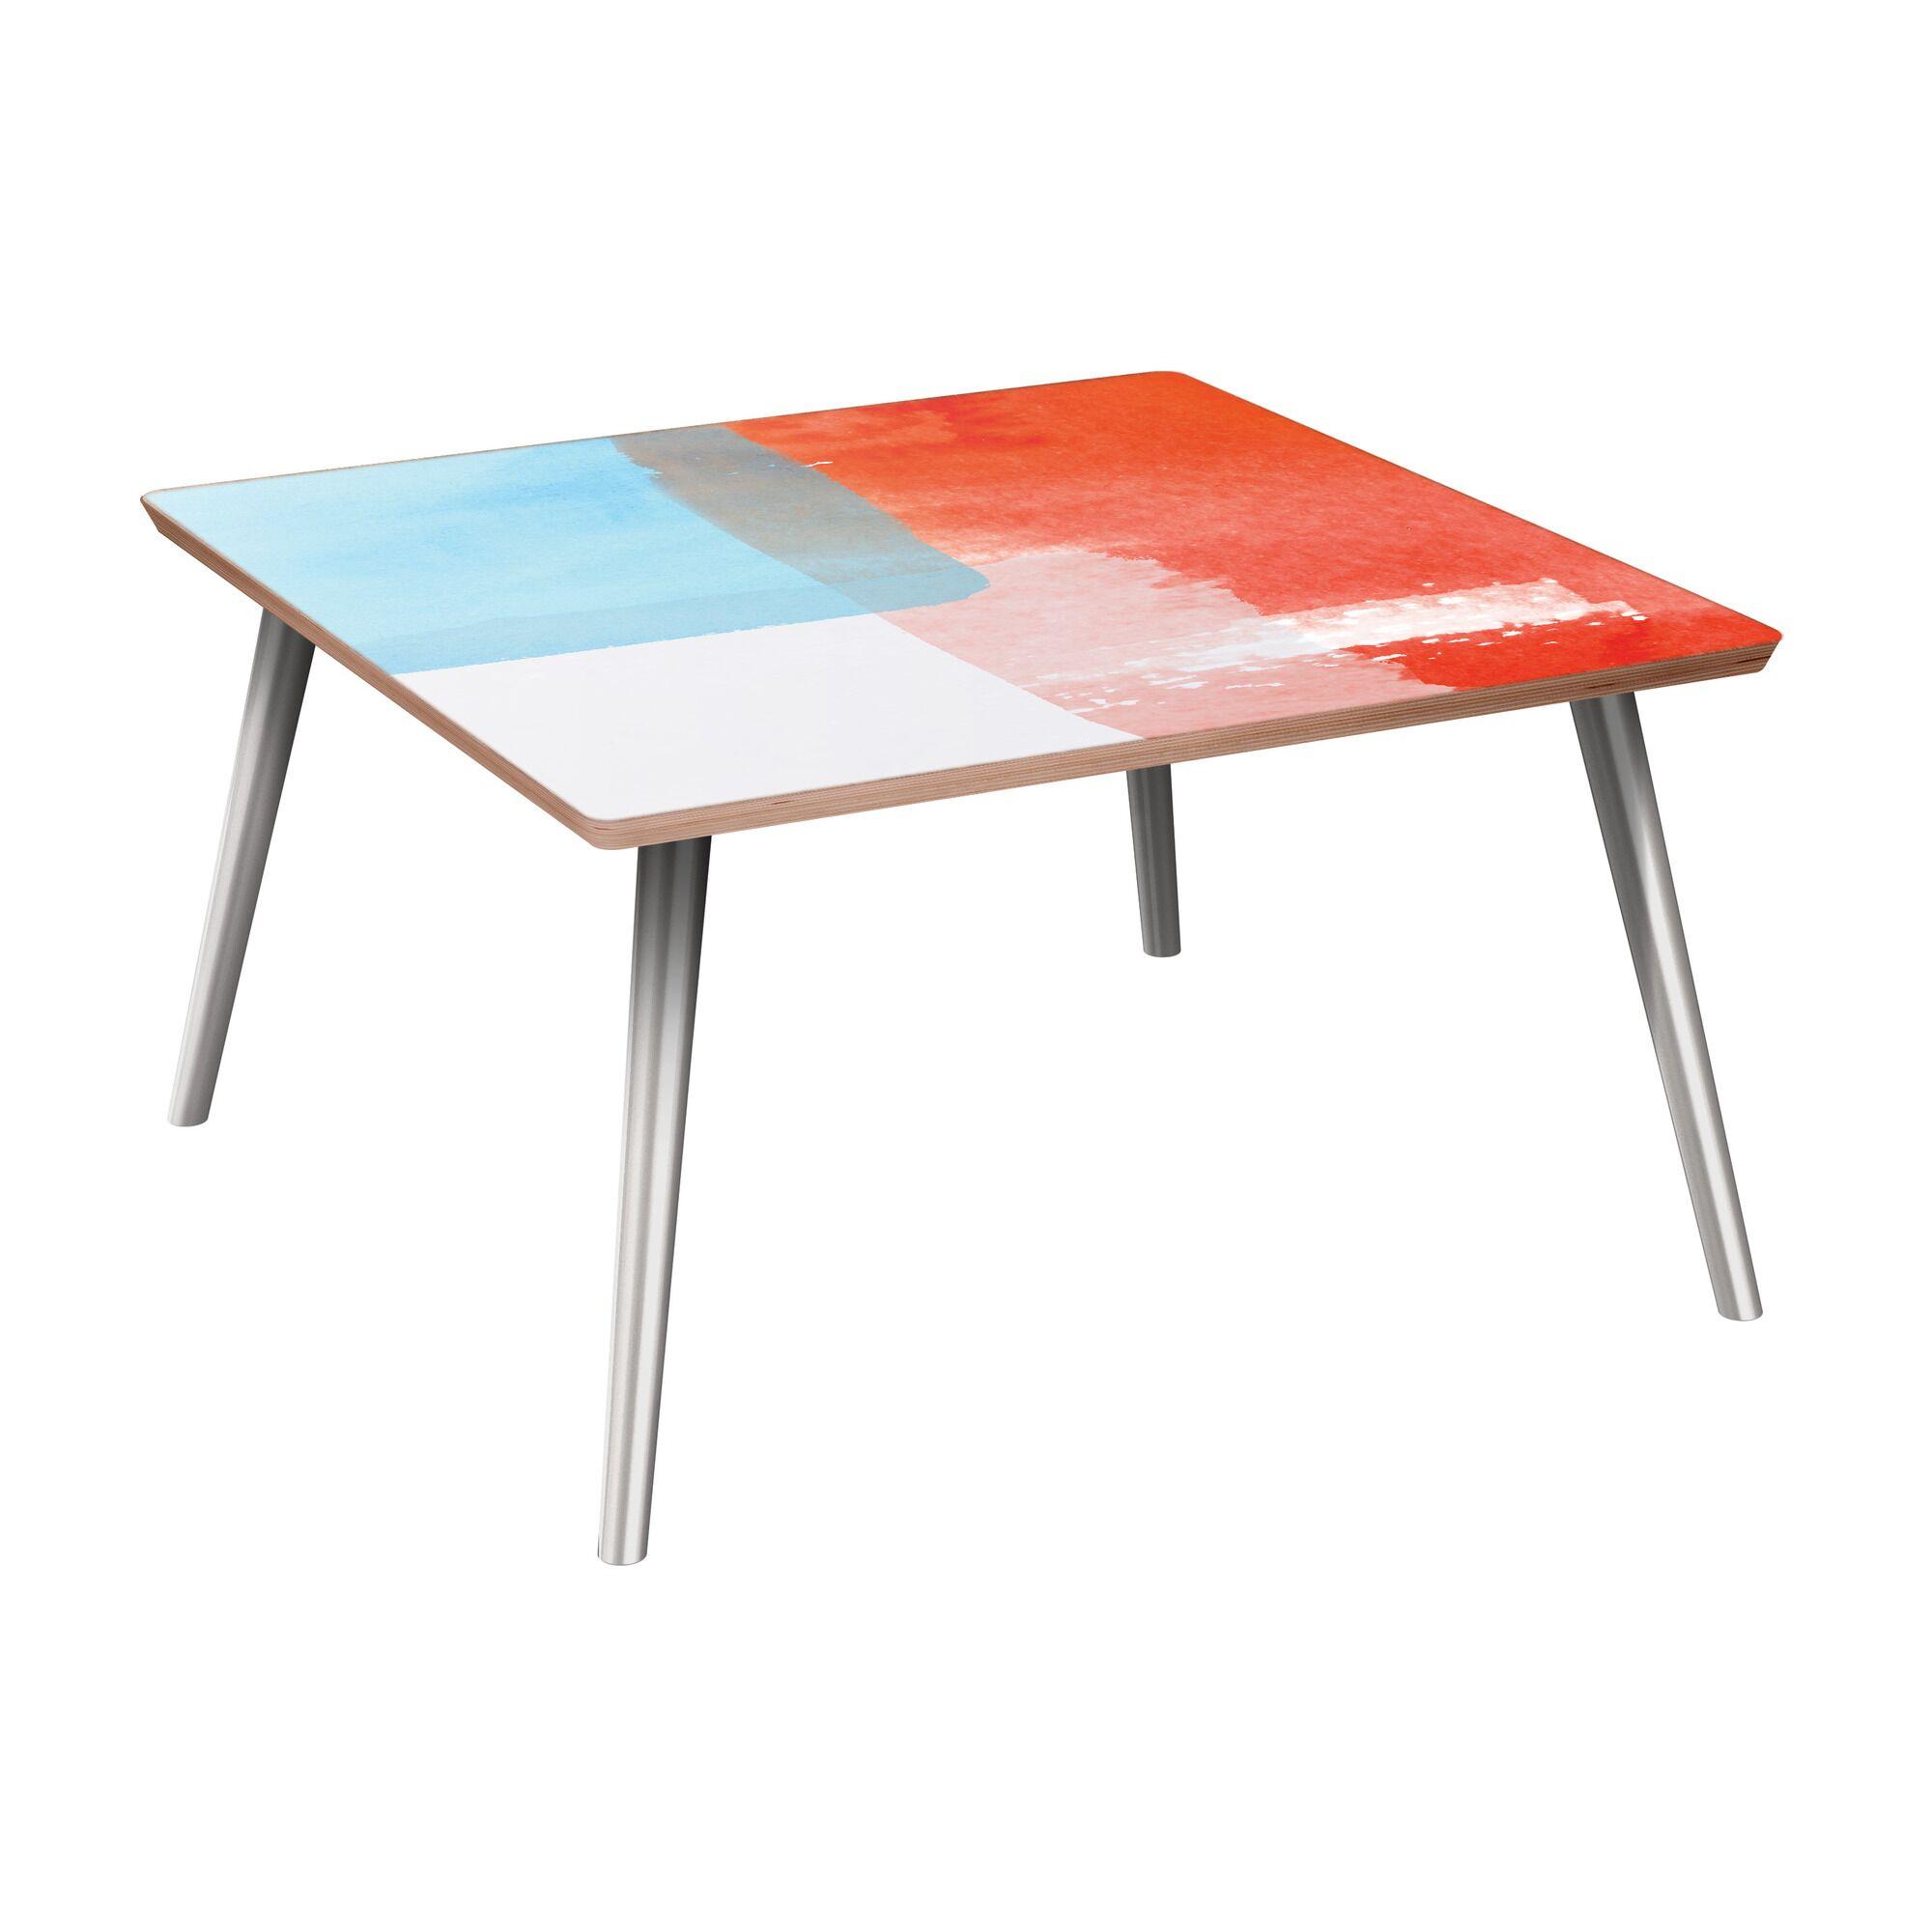 Estill Coffee Table Table Base Color: Chrome, Table Top Color: Walnut